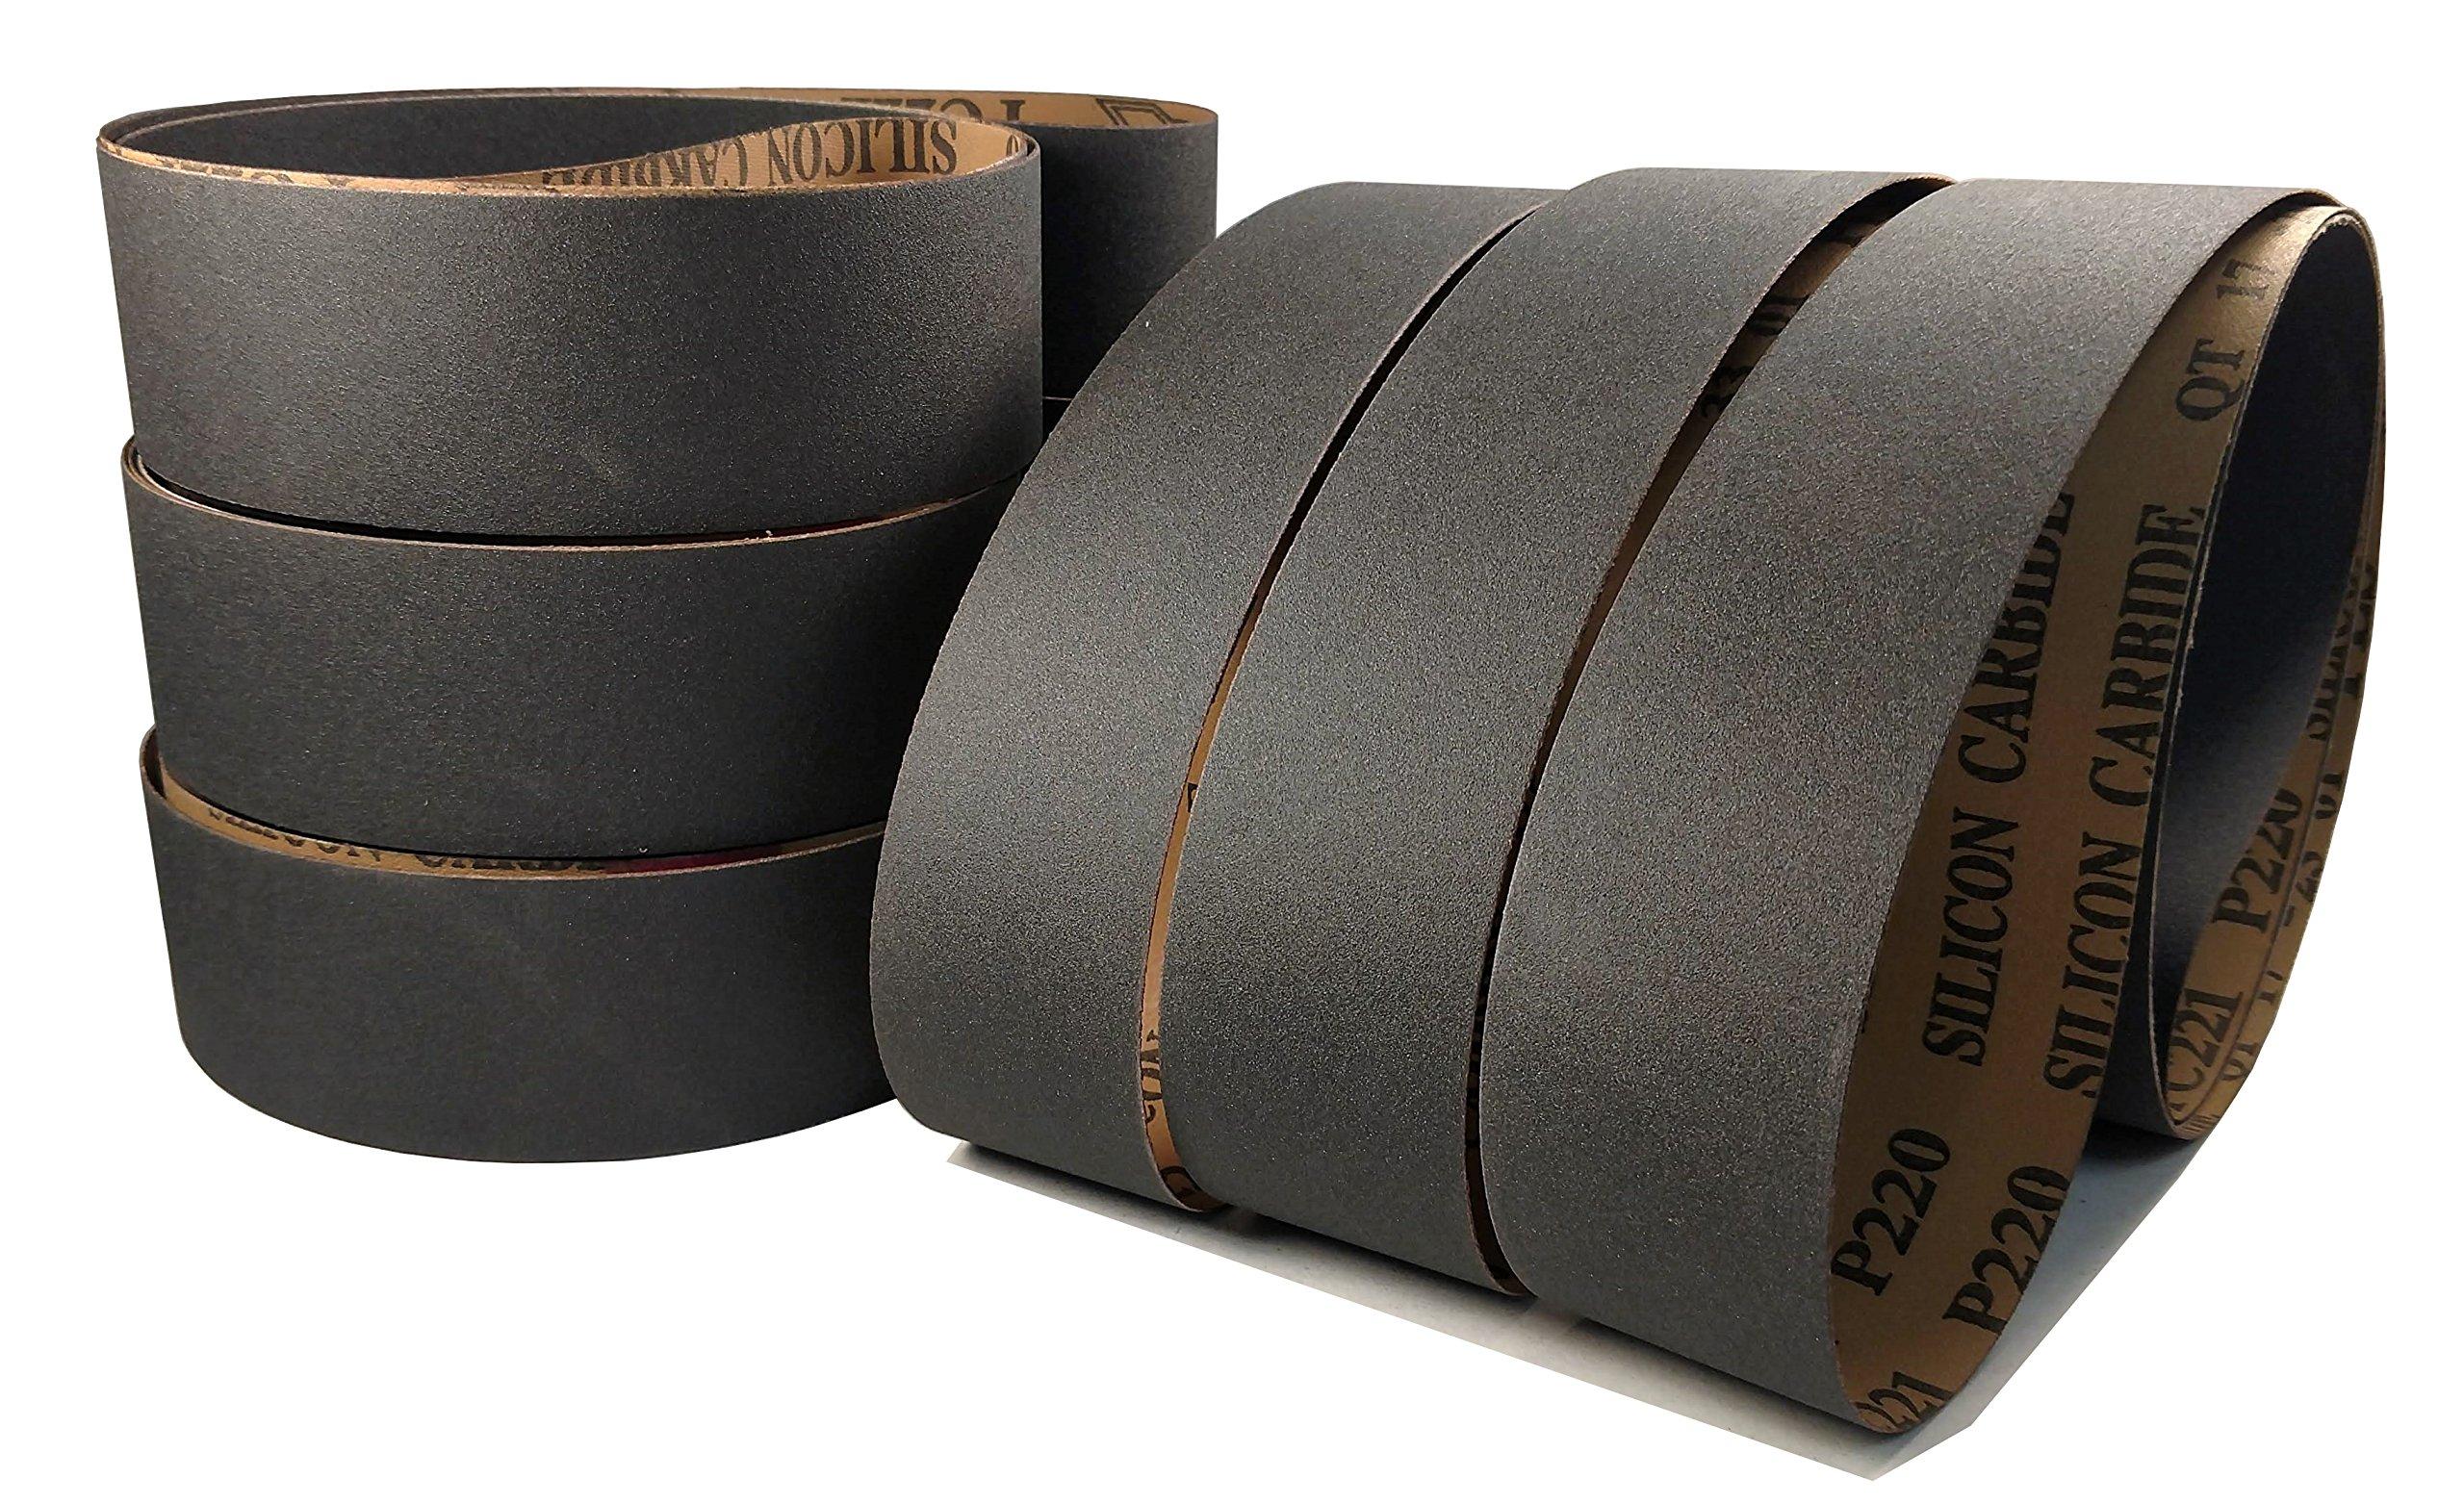 2 X 72 Premium Silicon Carbide Sanding Sharpening Belts - 6 Packs and Assortments (Fine Grit Assortment 220, 320, 400 Grit)